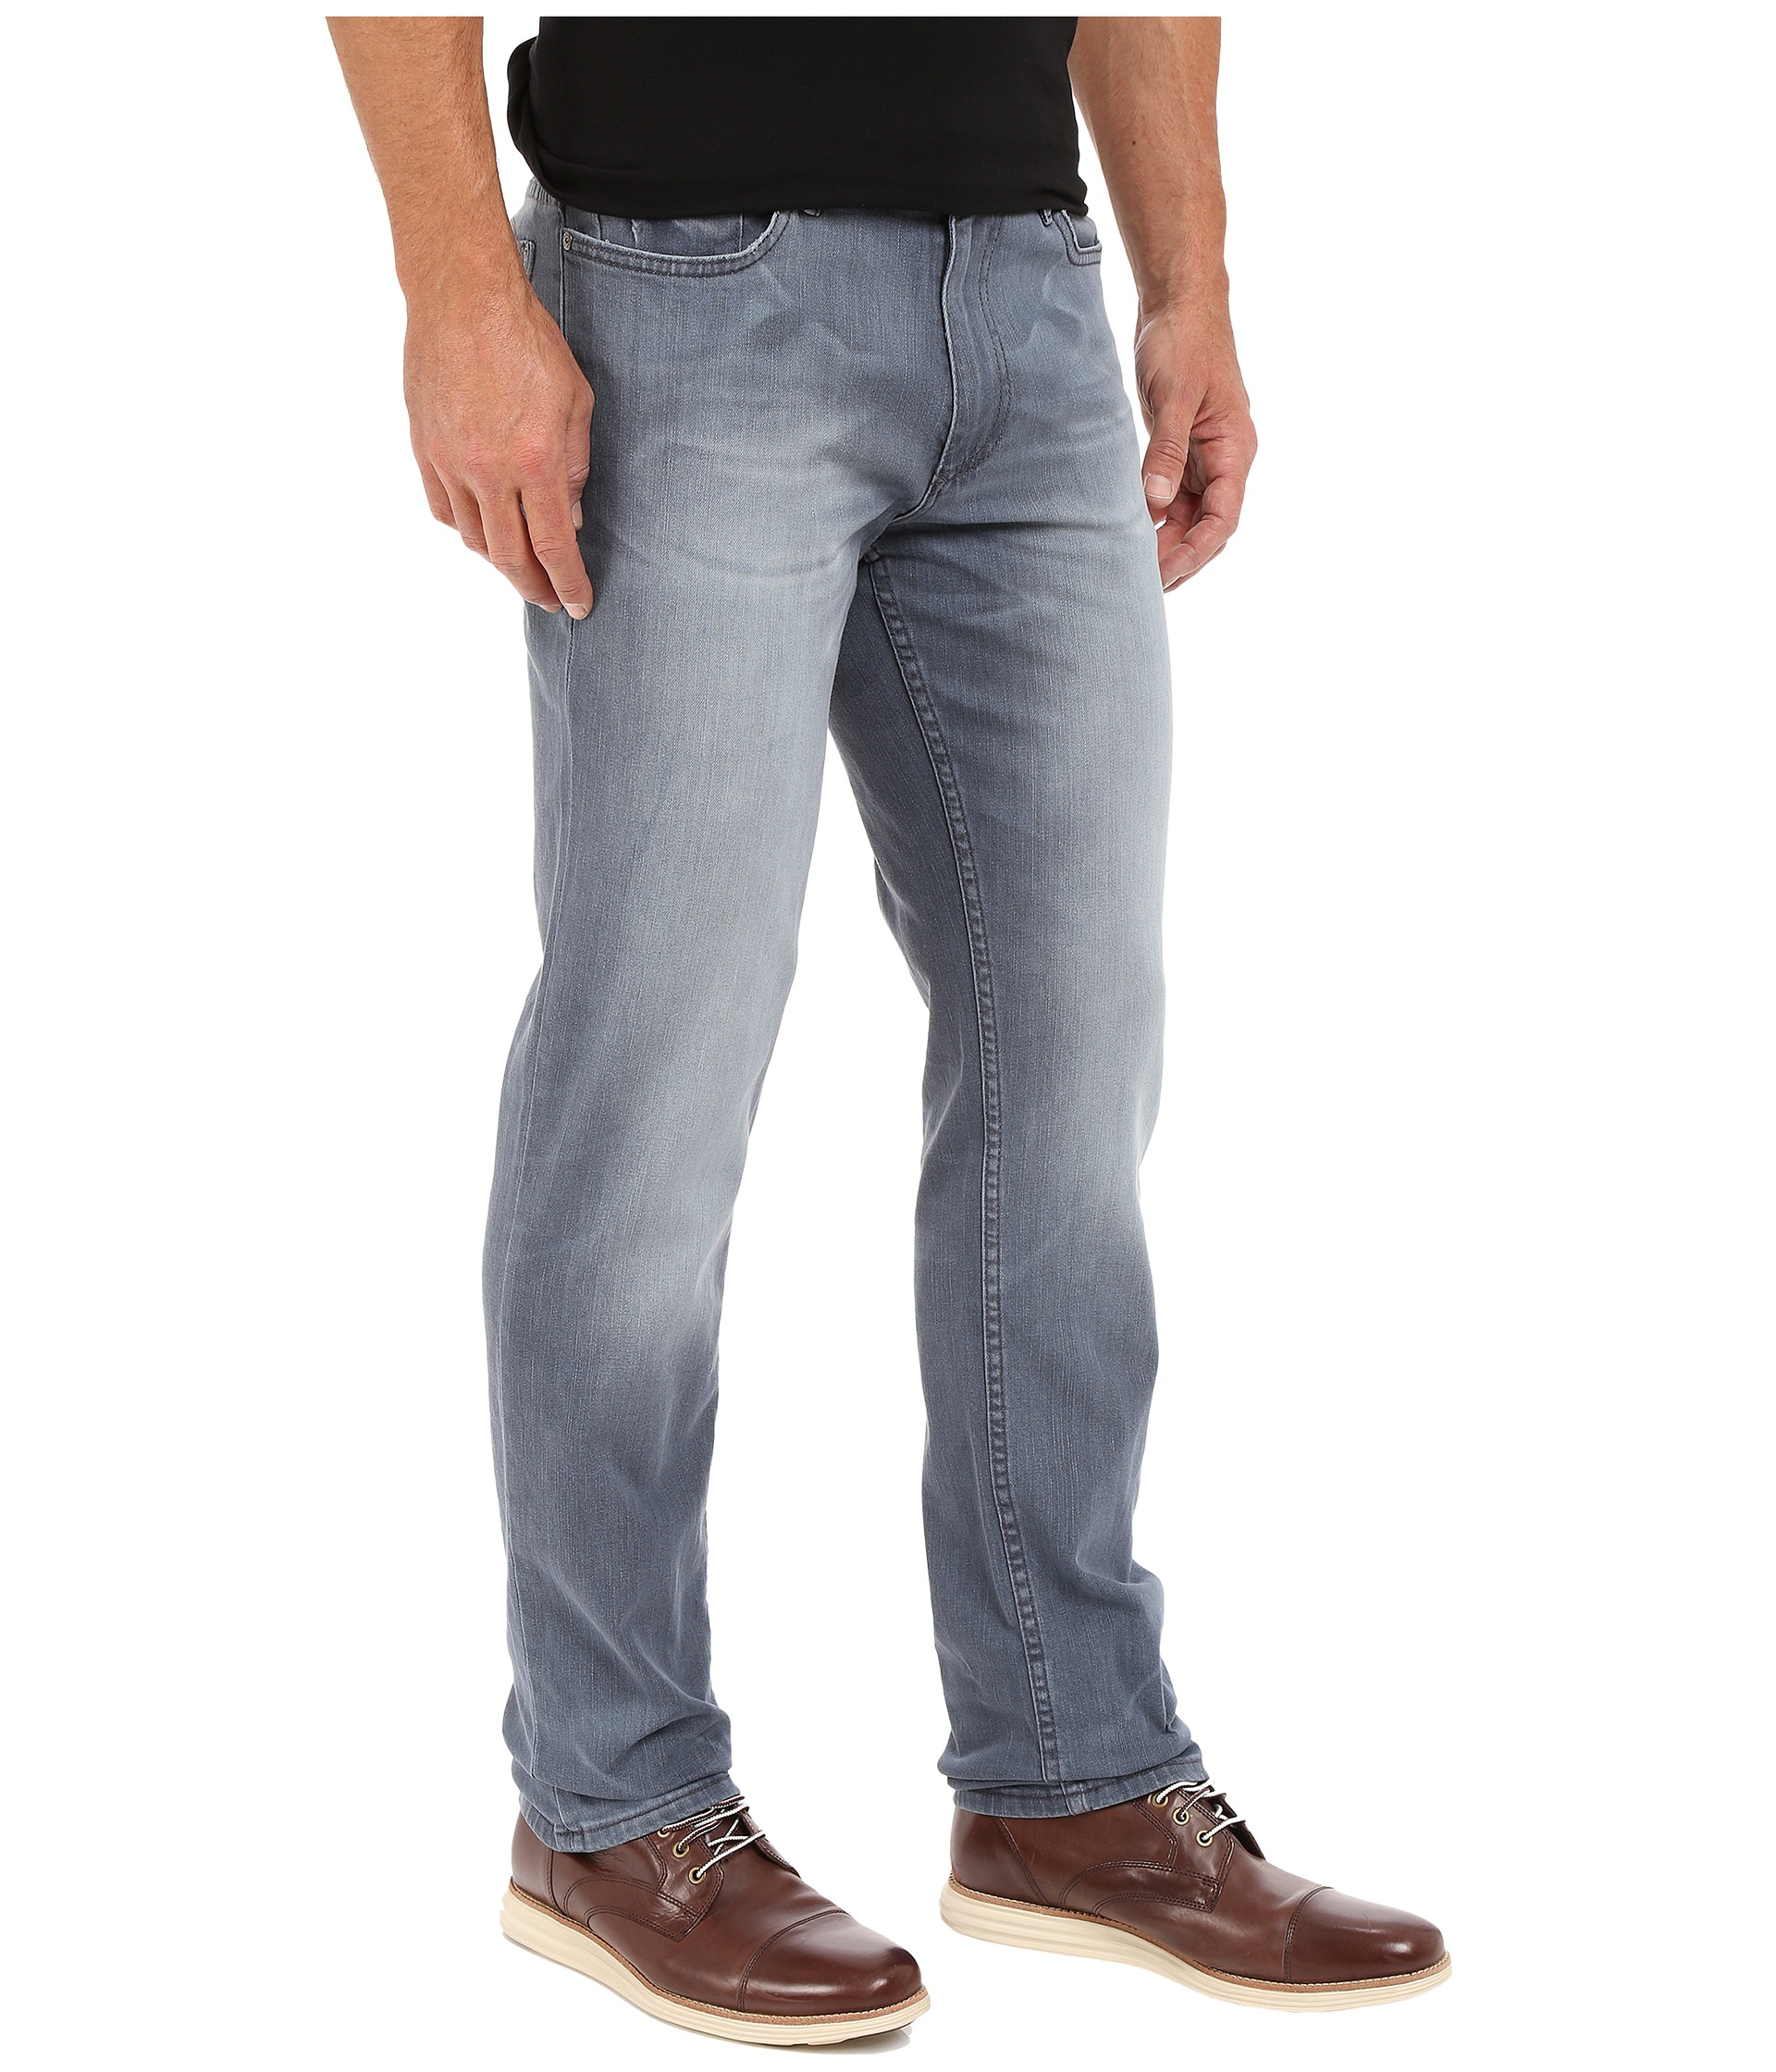 calvin klein jeans slim straight jeans in dusty indigo. Black Bedroom Furniture Sets. Home Design Ideas